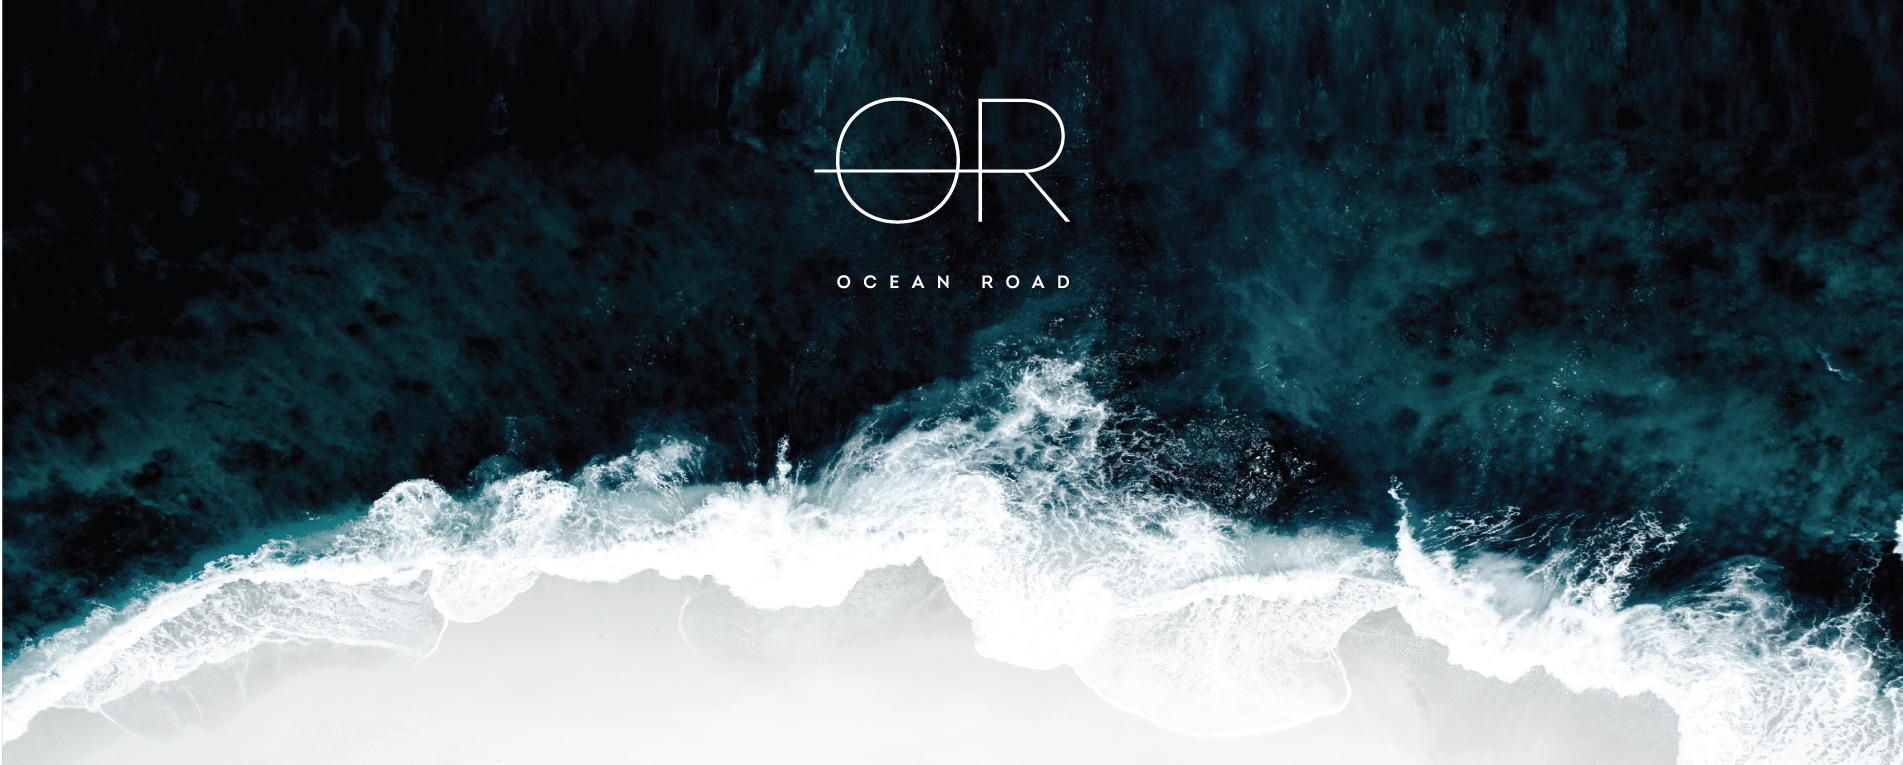 Ethical Spa & Salon Range (Ocean Road)